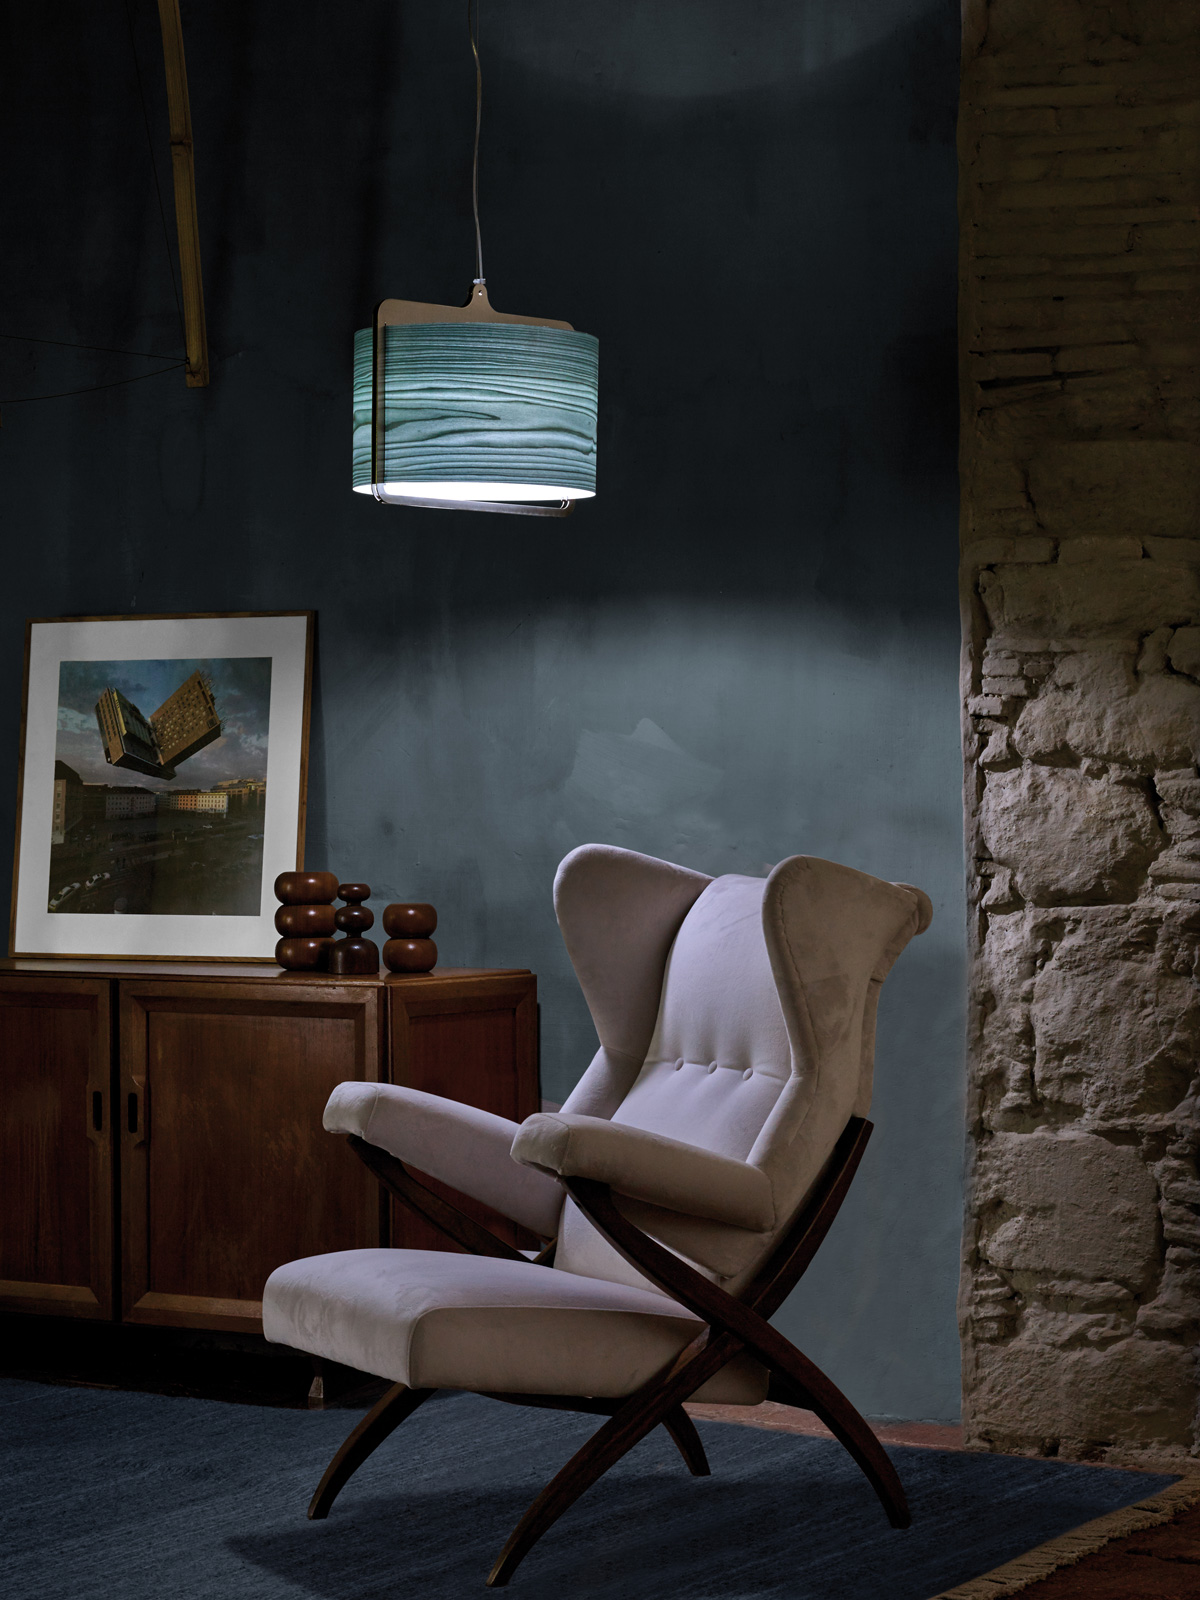 DesignOrt Blog: Materialmix bei LZF Lamps Icon Pendelleuchte